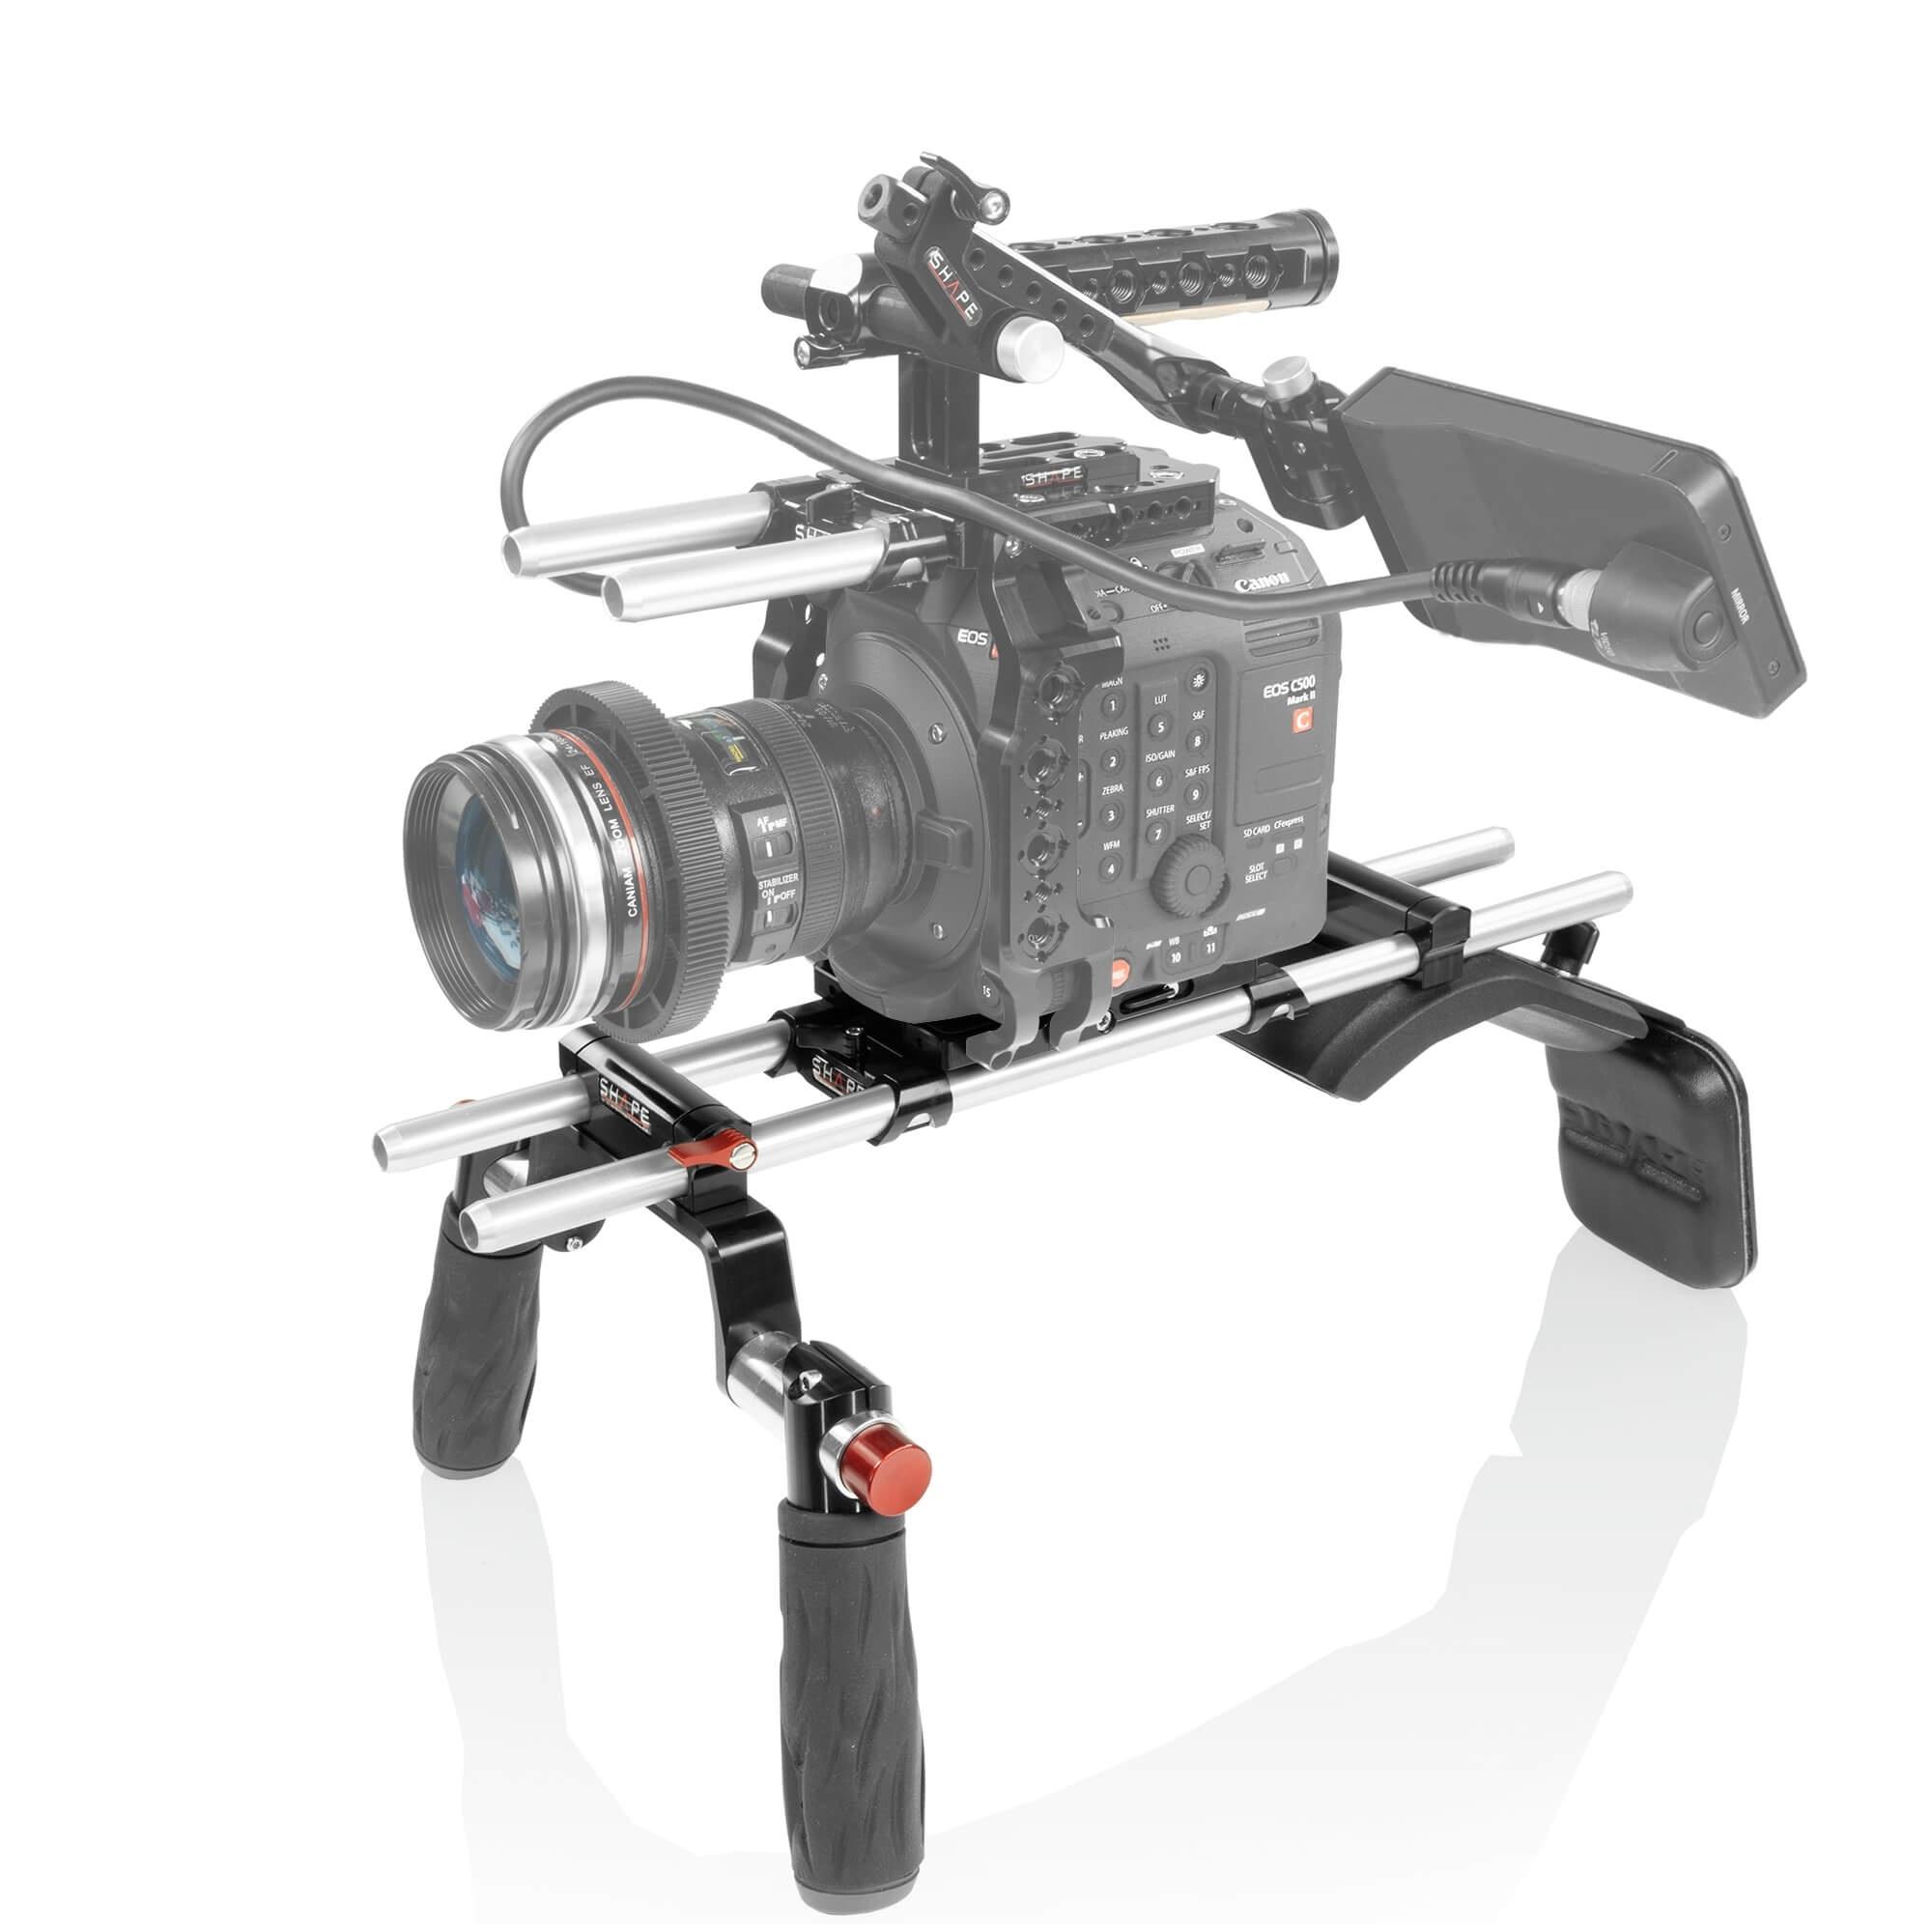 SHAPE Canon C500 Mark II Shoulder Mount